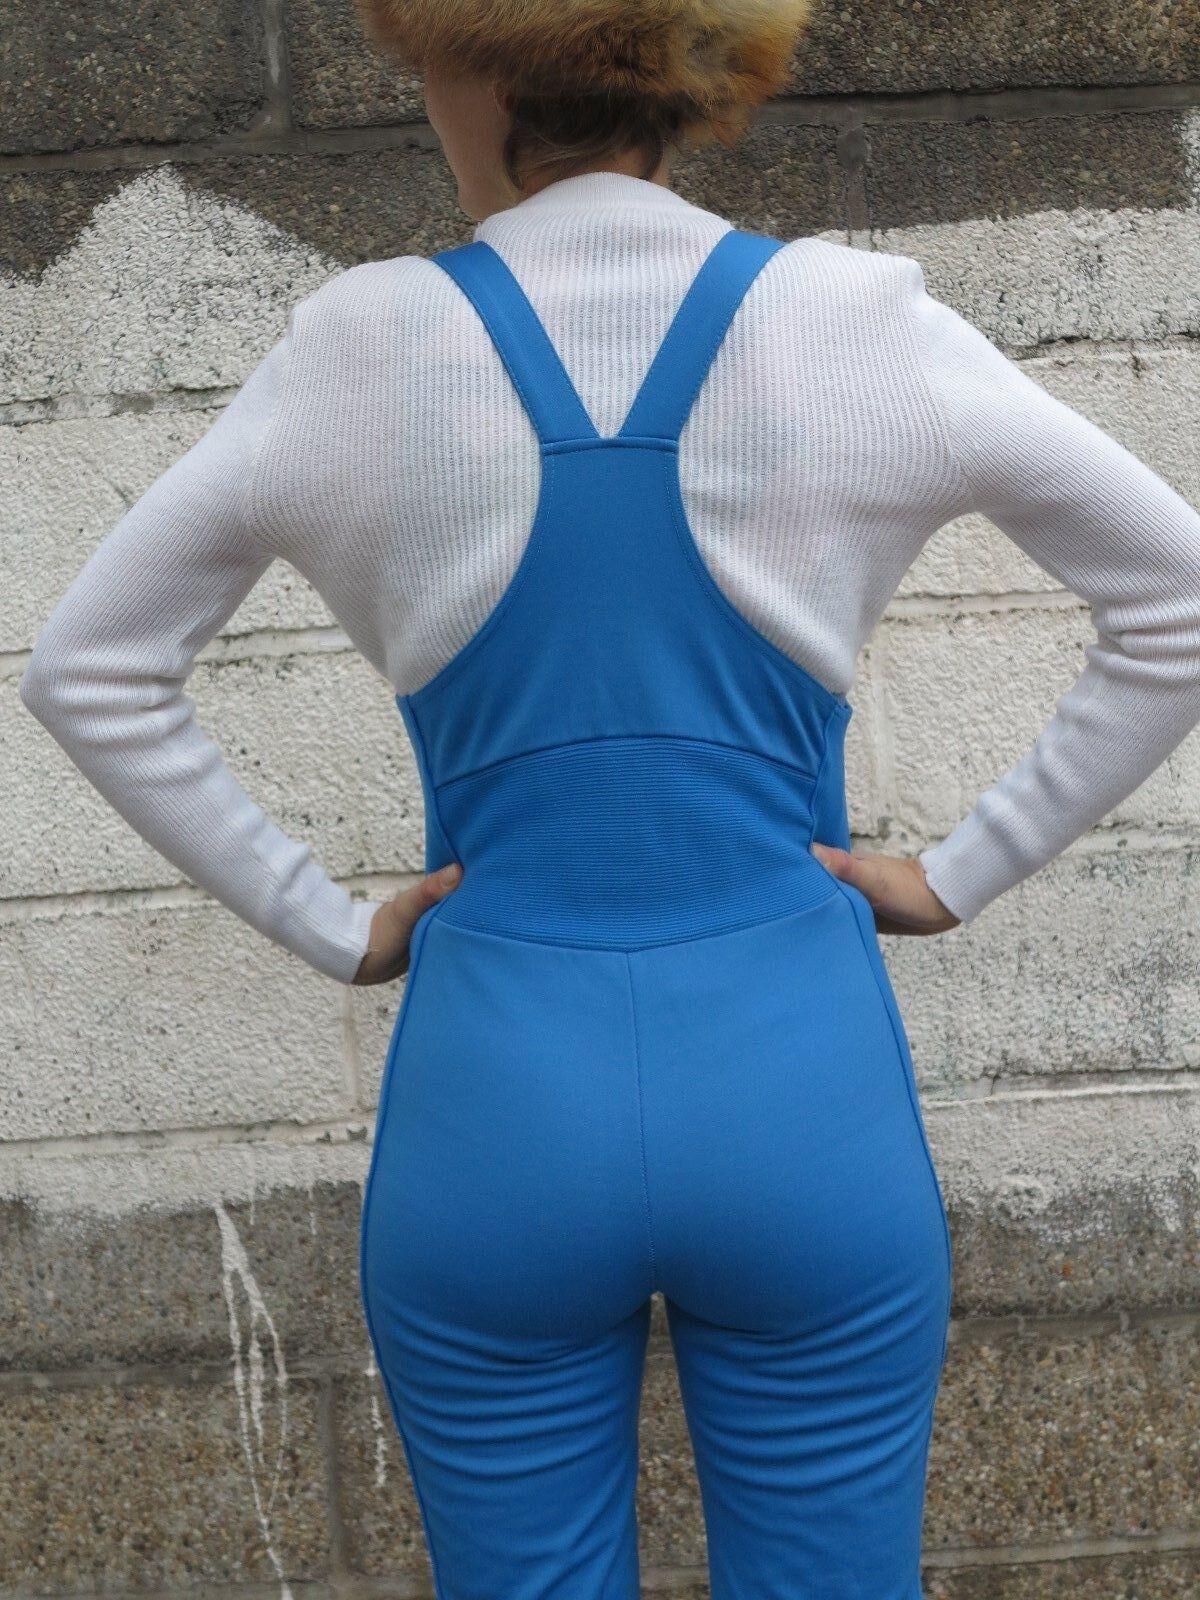 Adidas skihose 3 4 4 4 legs blau Latzhose skisuit 70er True VINTAGE 70s ski trousers  | Verkaufspreis  99e1f2